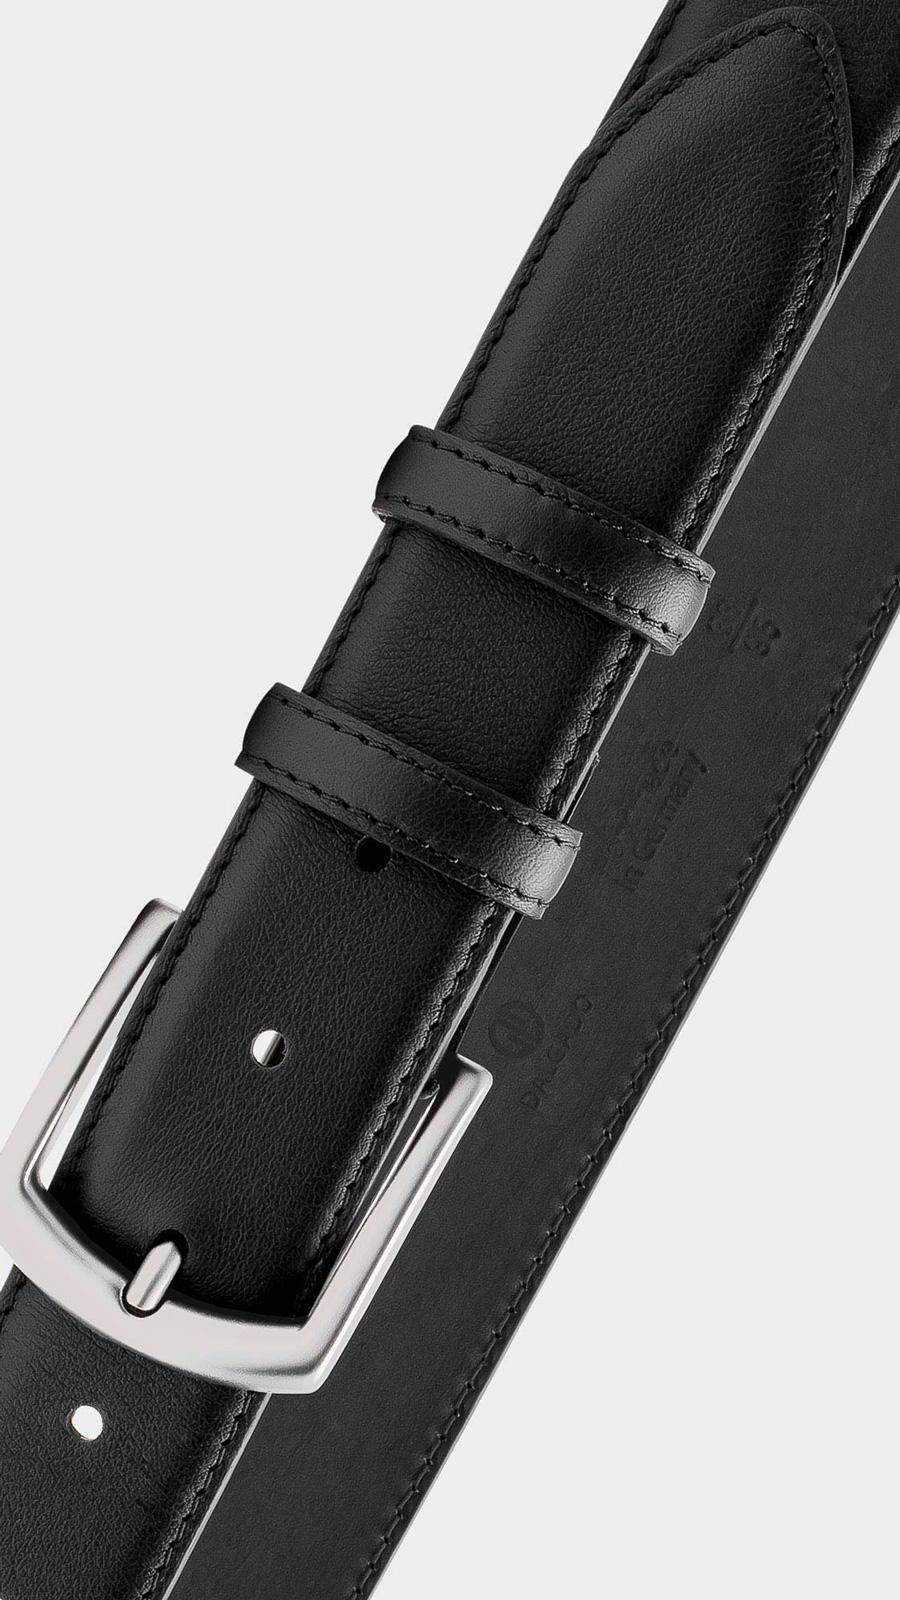 OPUMO-Dalgado-Belts-Sizing-Guide-1